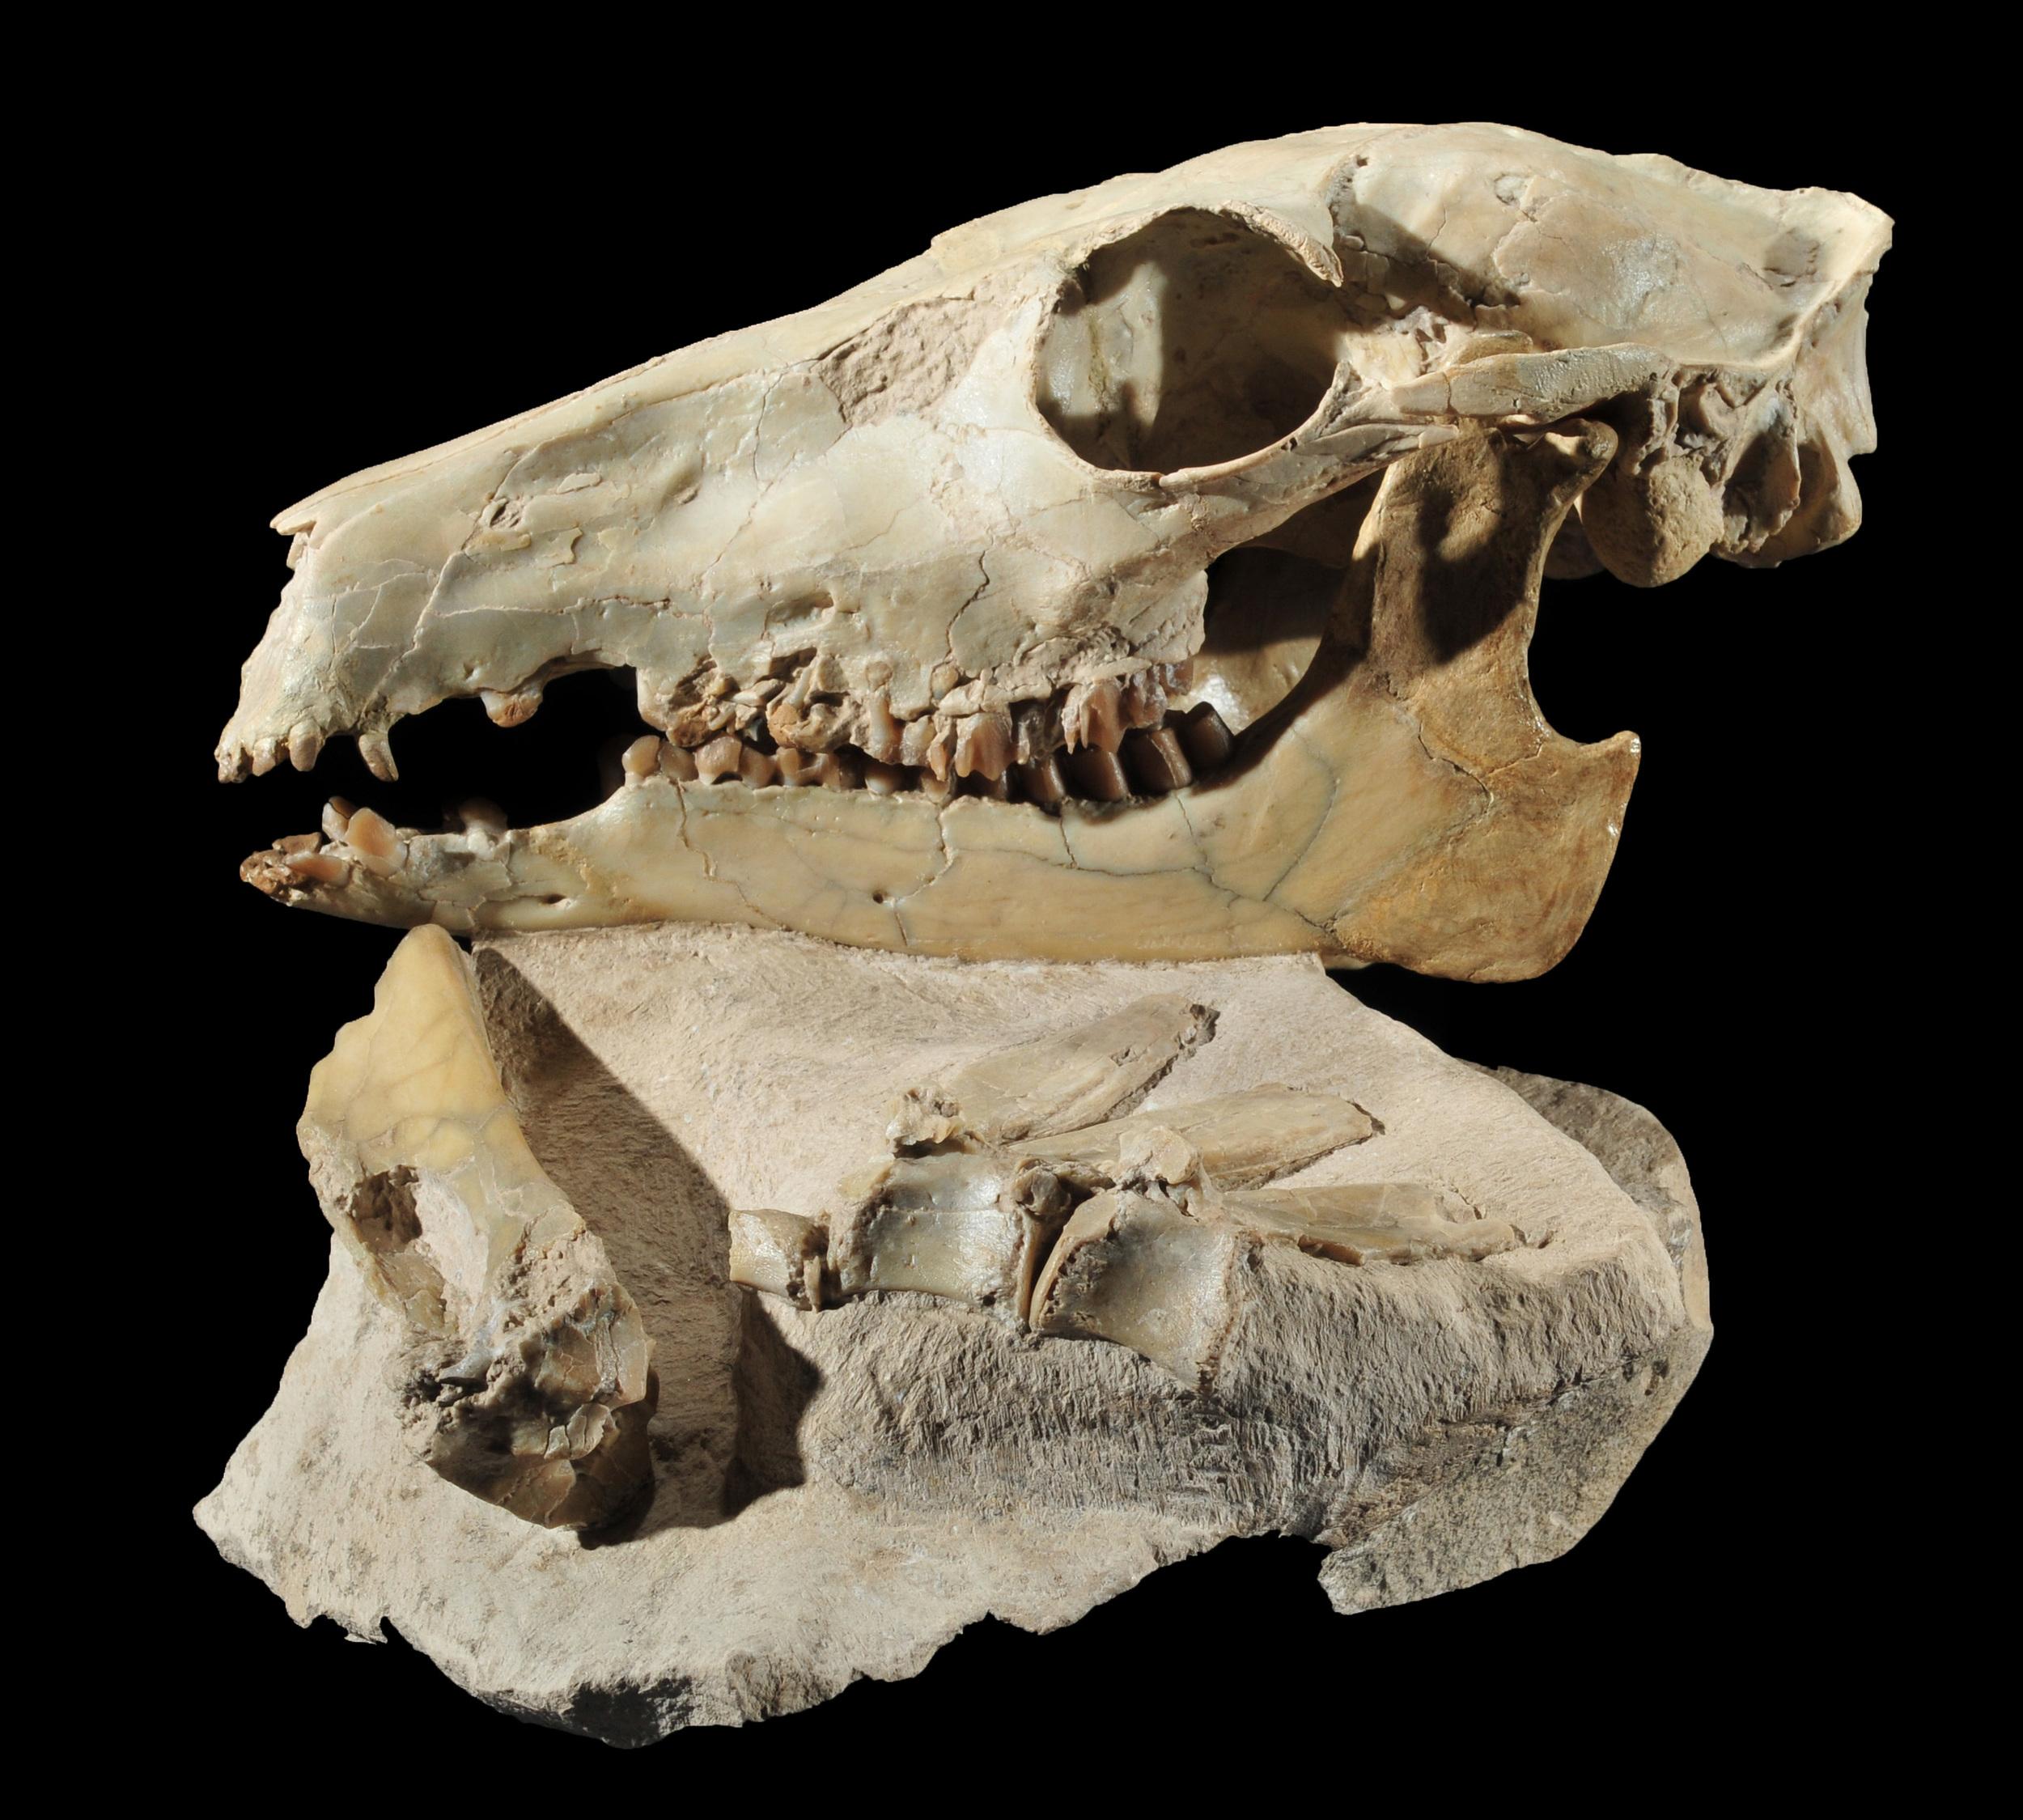 Poebrotherium camel skull